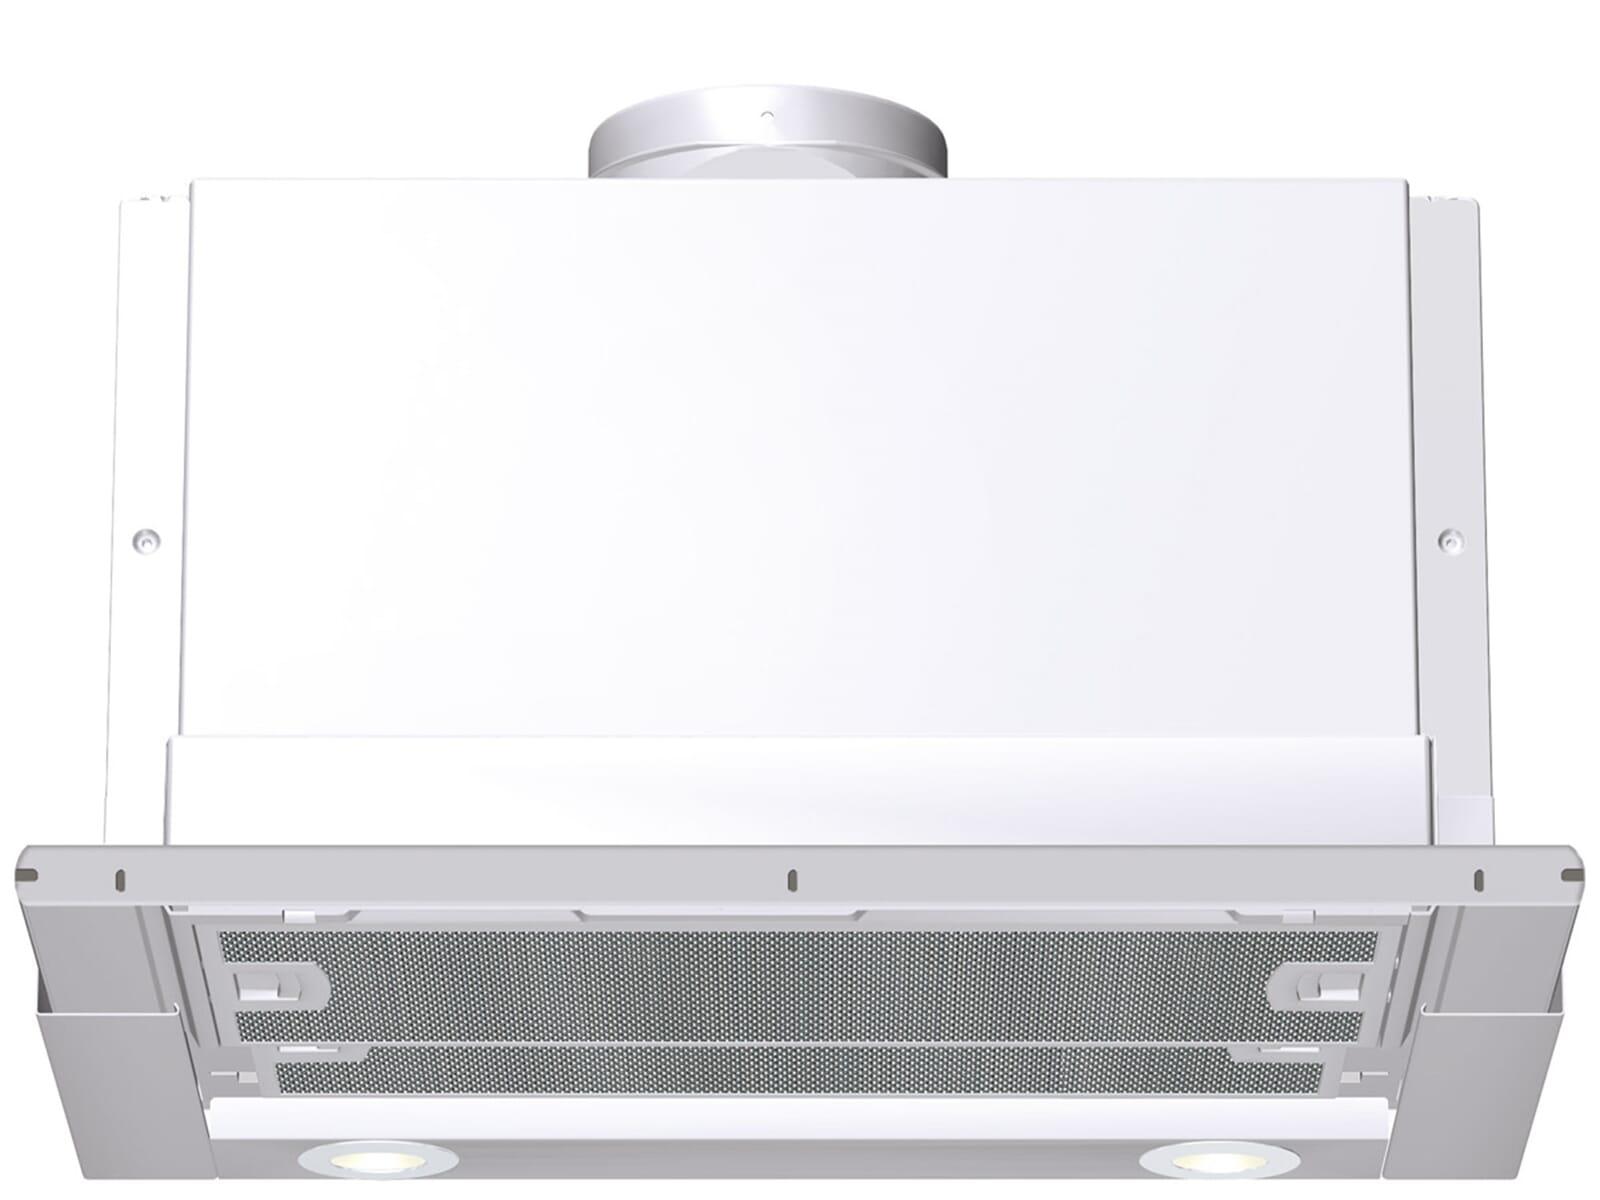 siemens li48632 flachschirm dunstabzugshaube silbermetallic f r 374 90 eur. Black Bedroom Furniture Sets. Home Design Ideas